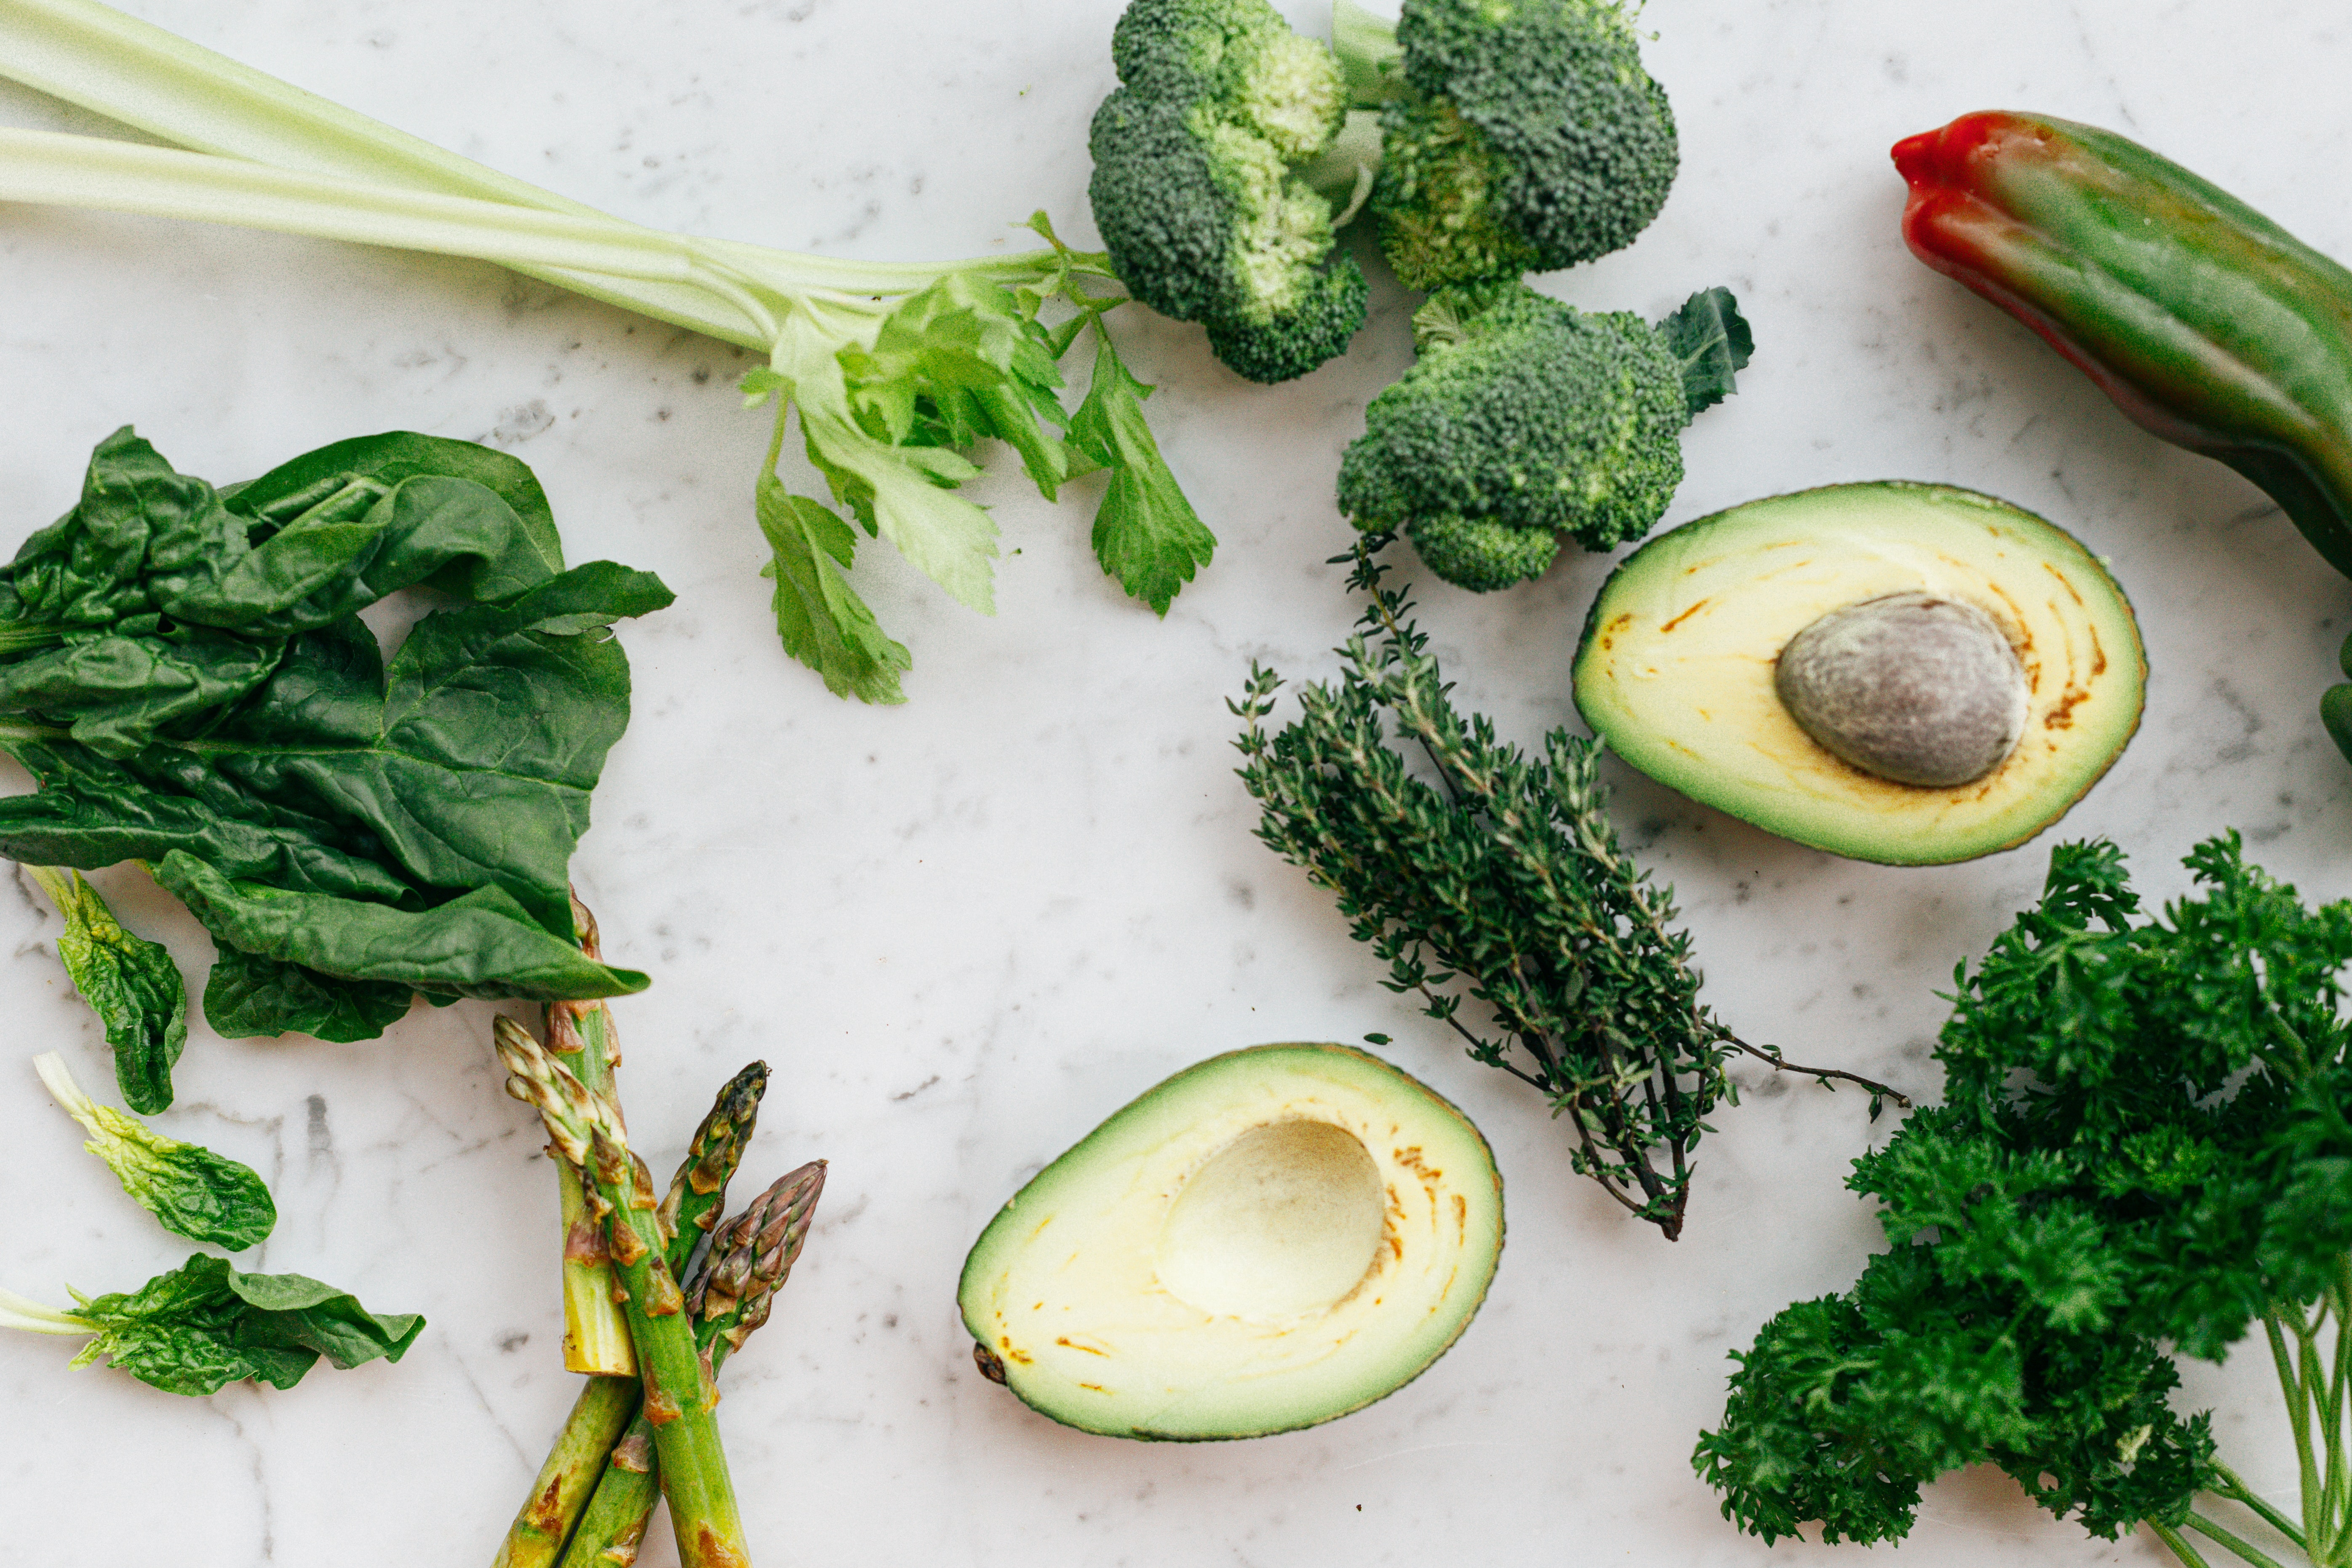 boil green vegetables when breaking a prolonged fast